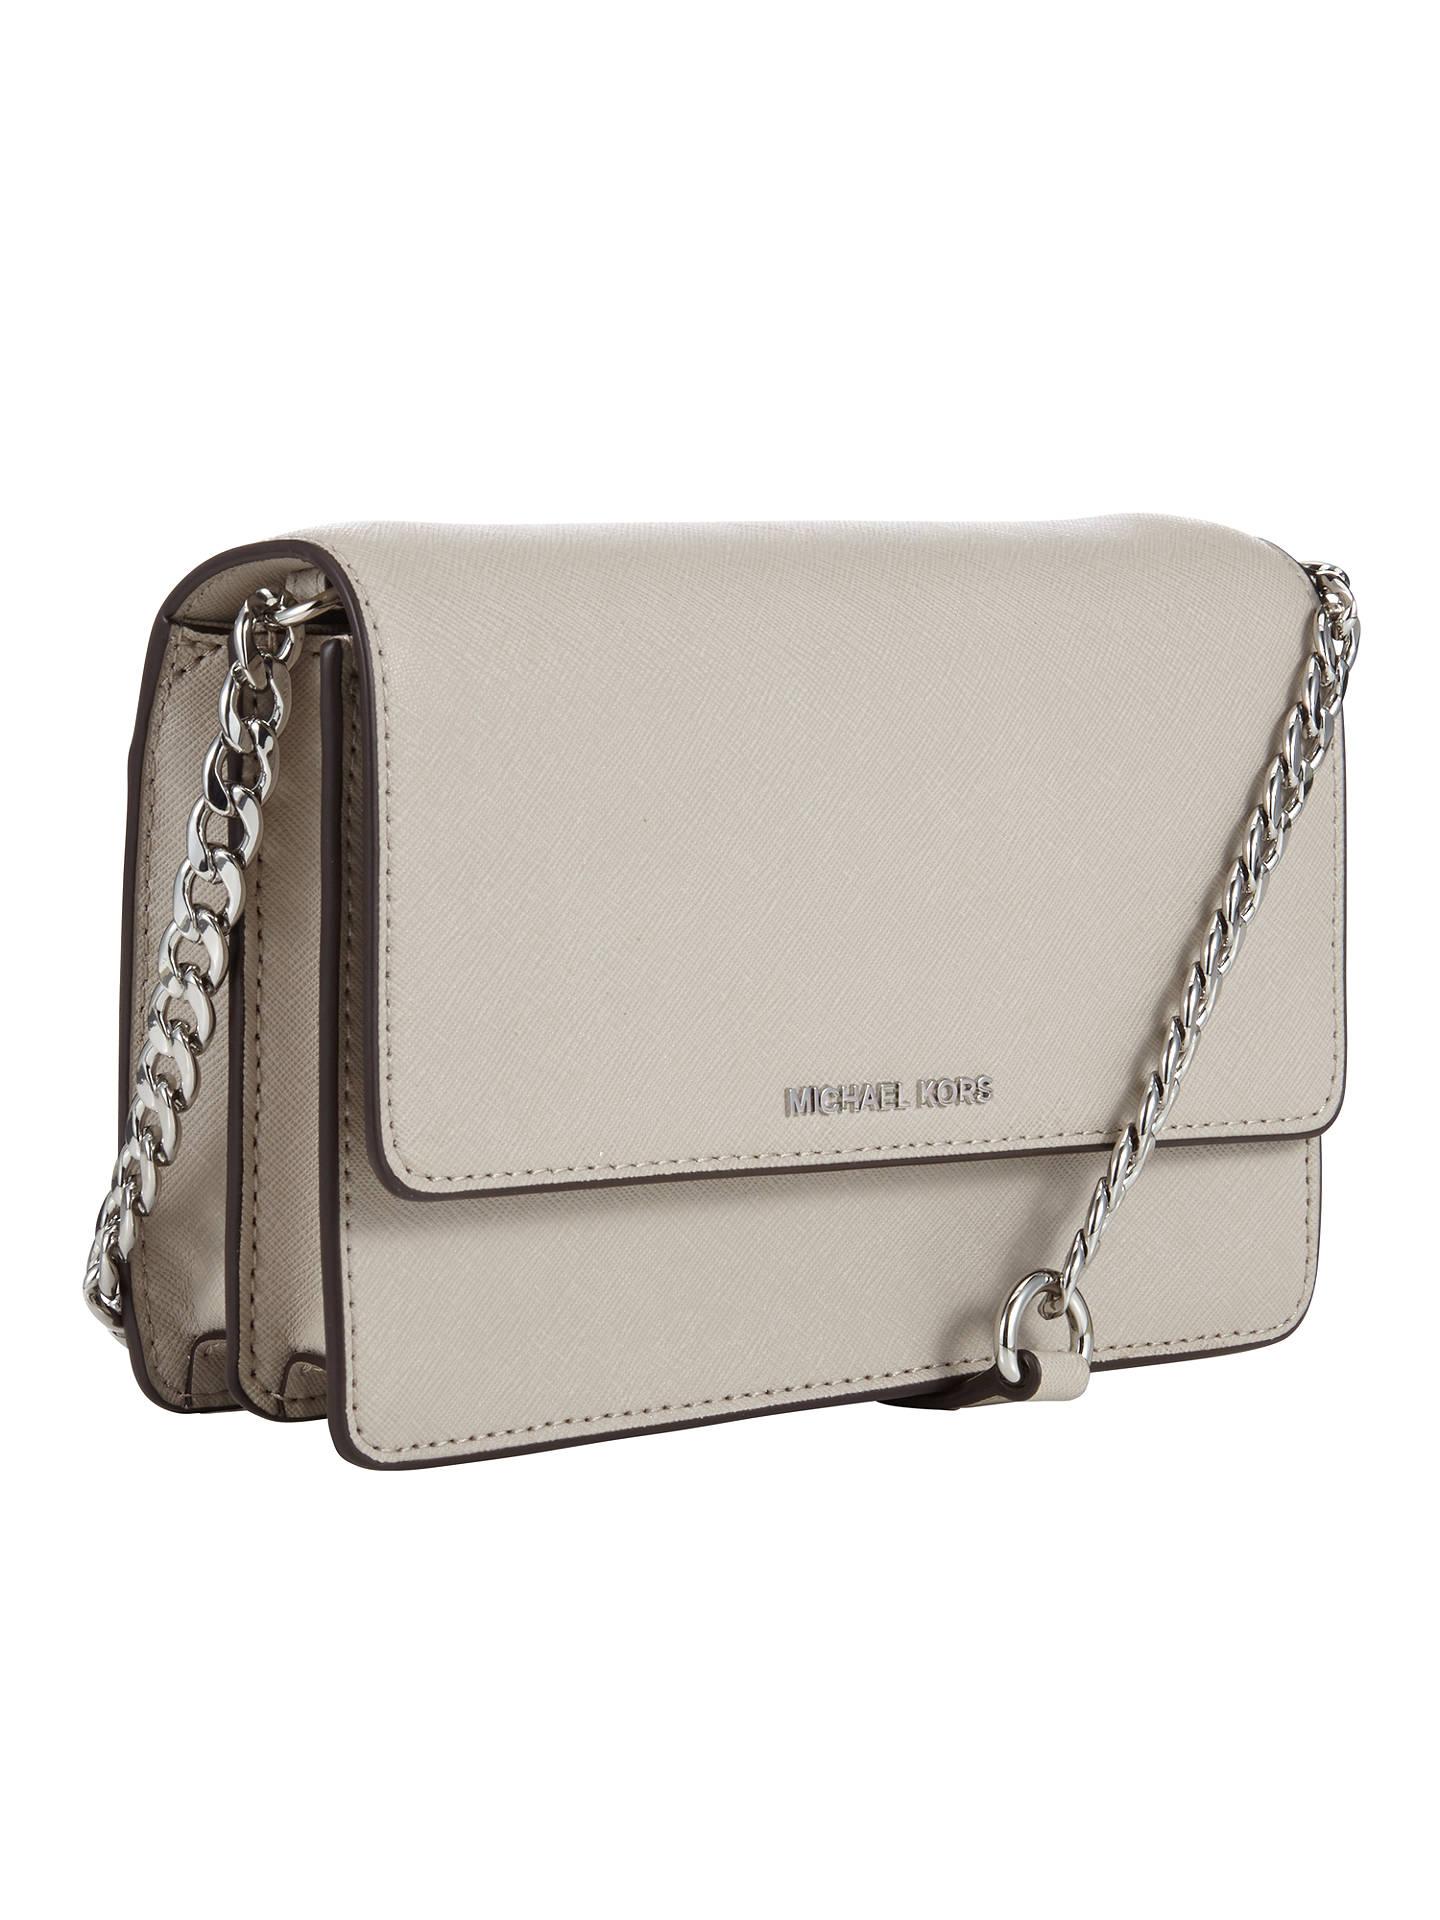 889e538cd5bd MICHAEL Michael Kors Daniela Small Leather Across Body Bag at John ...